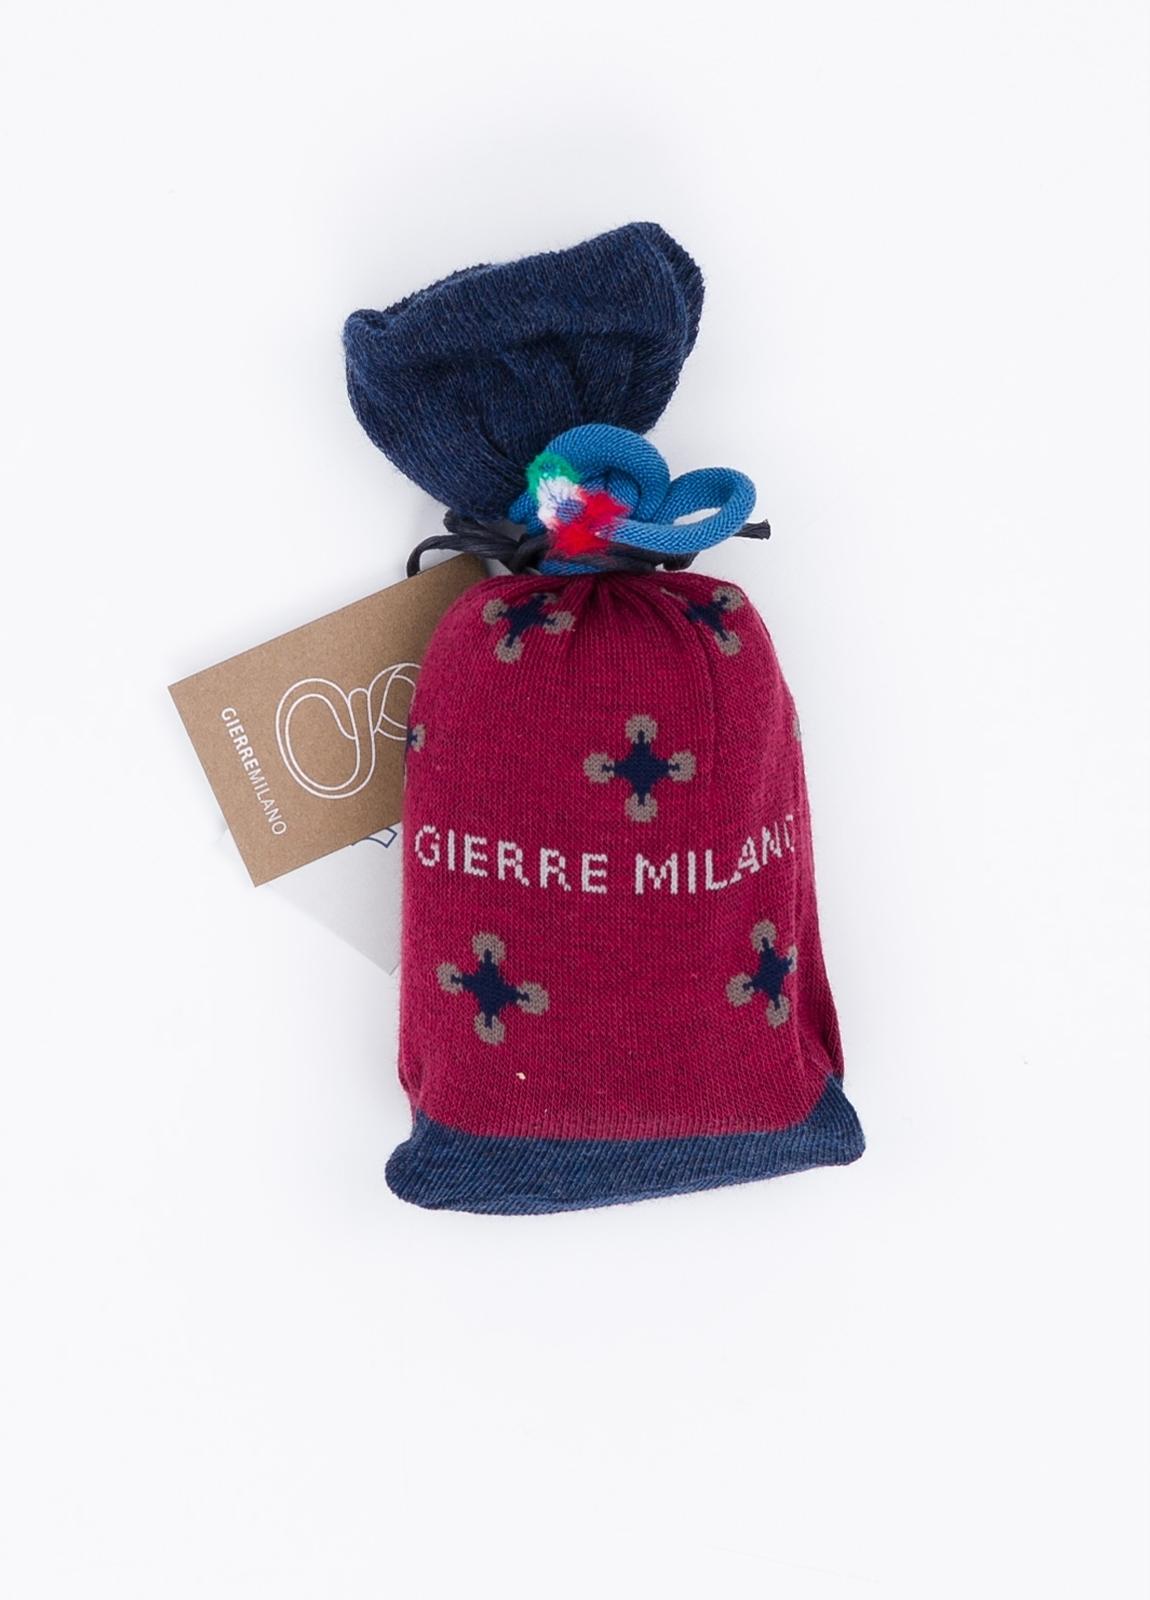 Calcetín GIERRE MILANO corto flores granate. - Ítem1